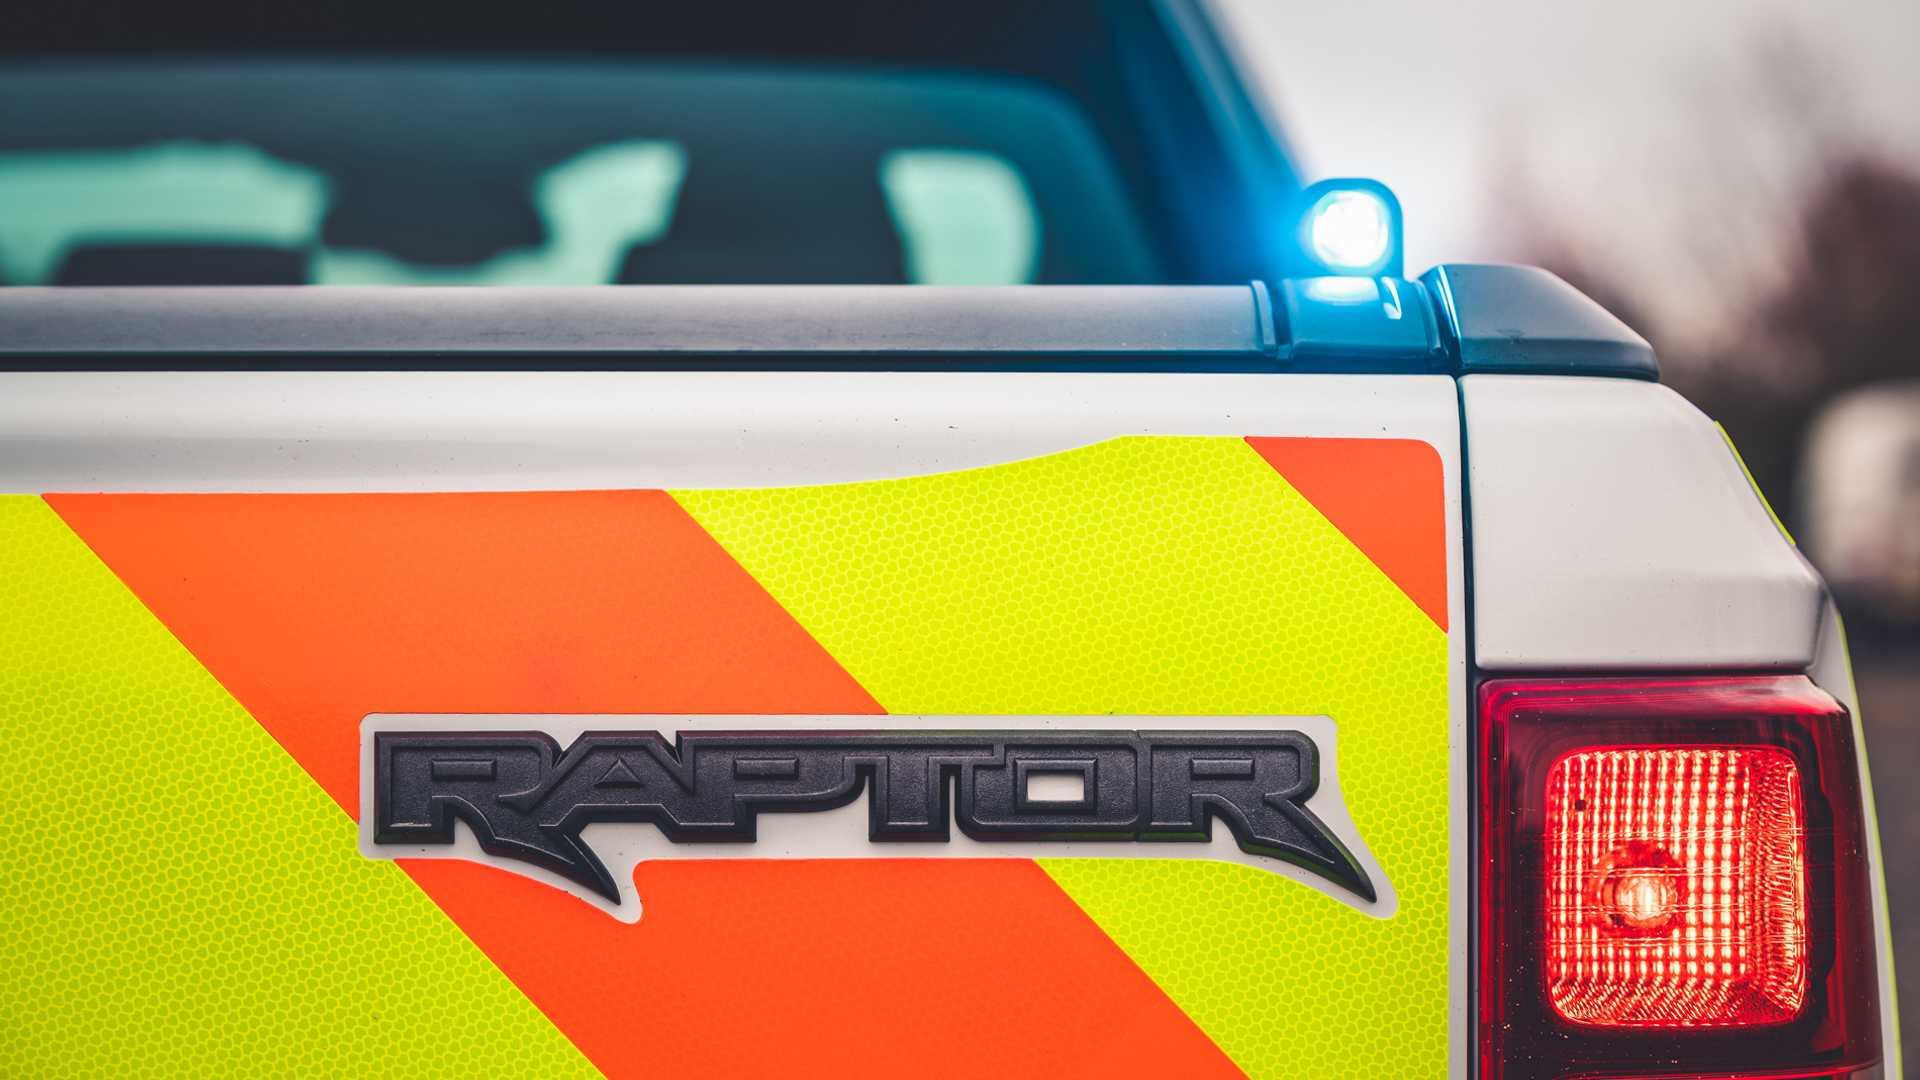 Ford-Focus-ST-and-Ranger-Raptor-UK-police-cars-19